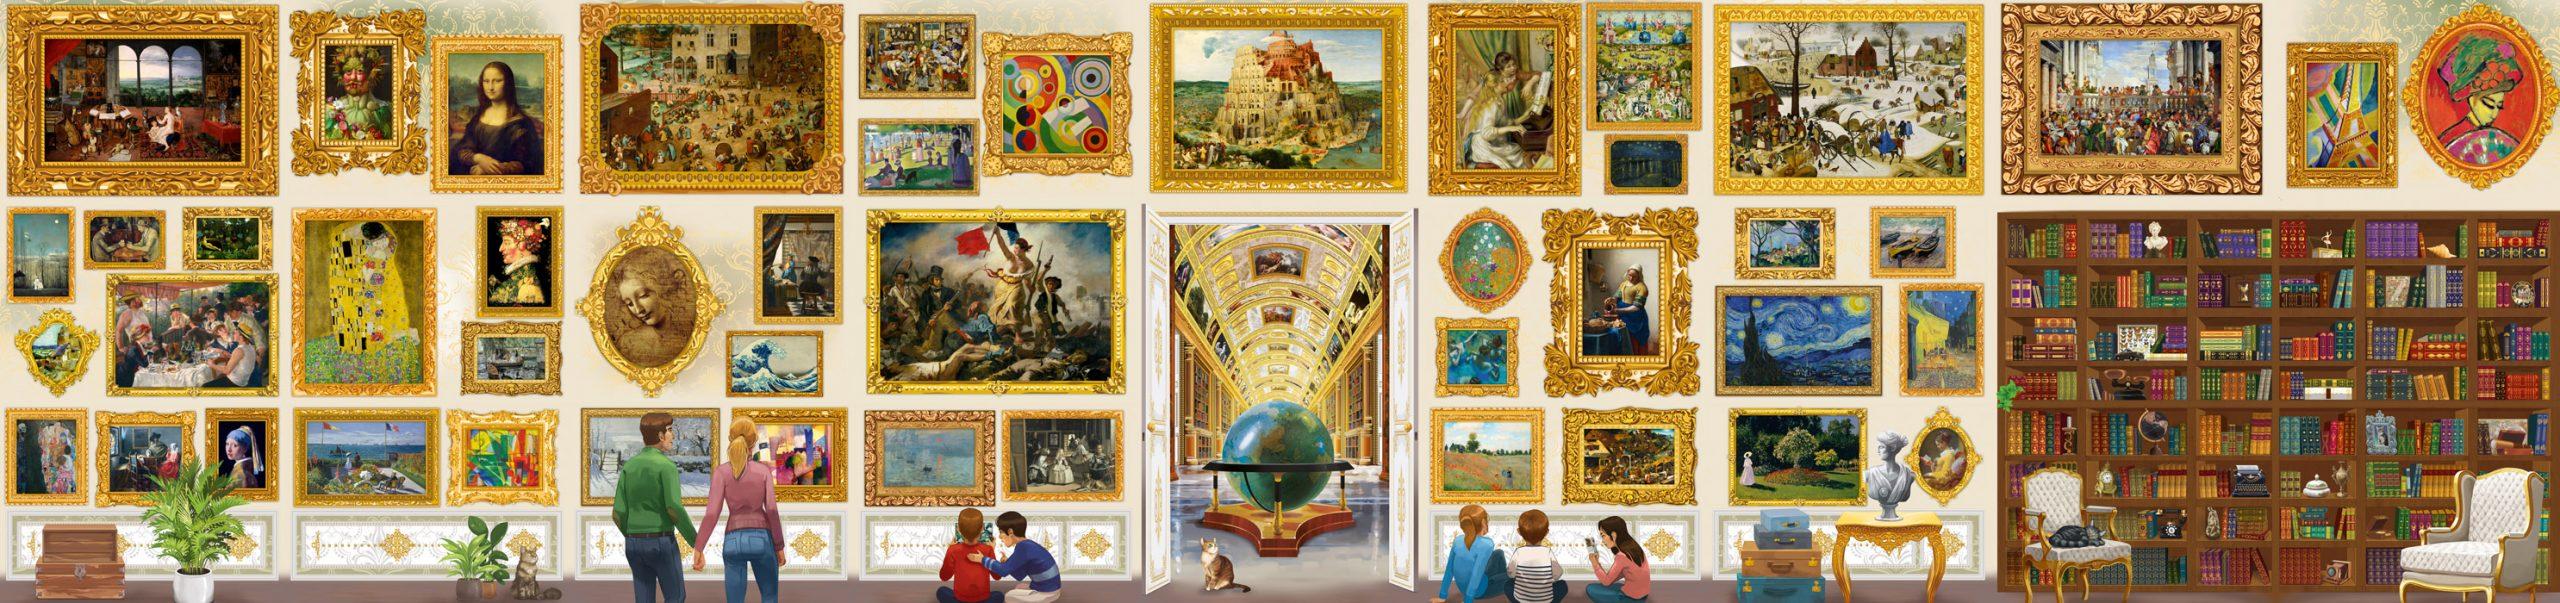 puzzle - travel around art